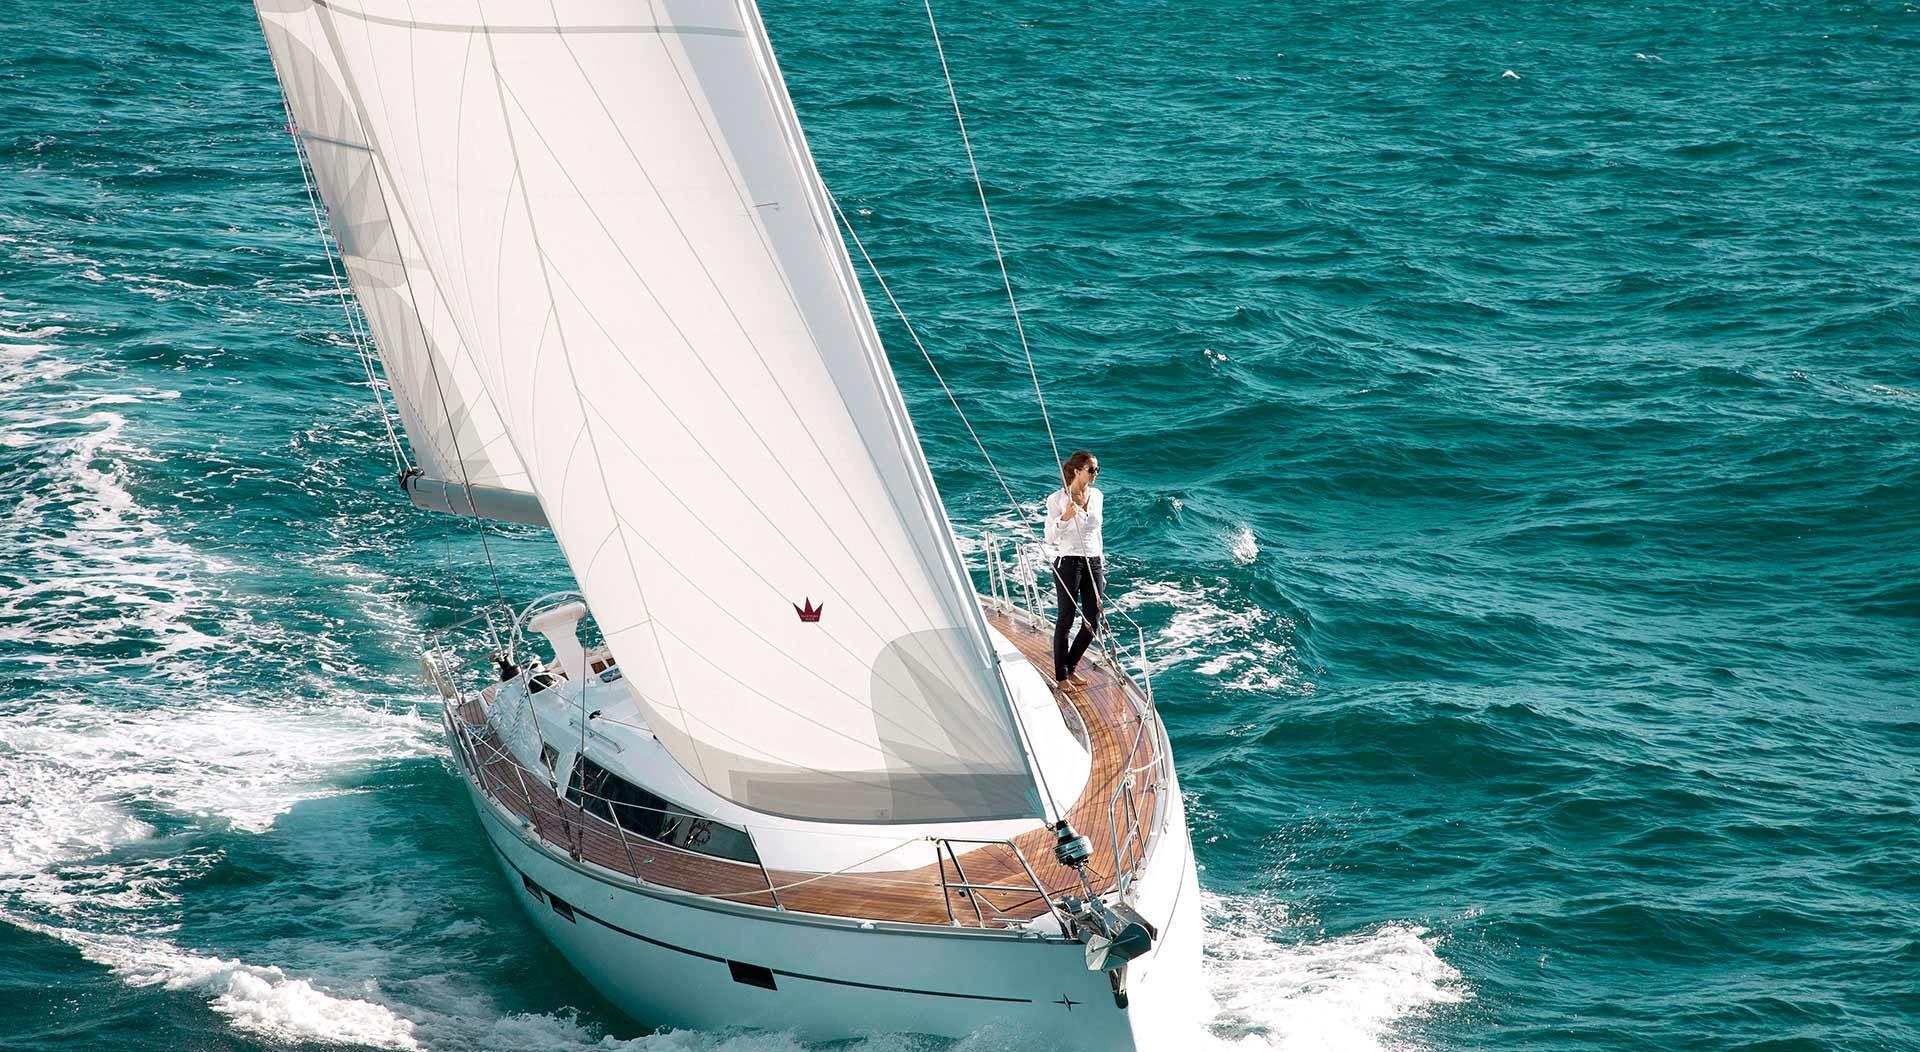 Bavaria yachtbau cruiser 46 boat sailing yacht